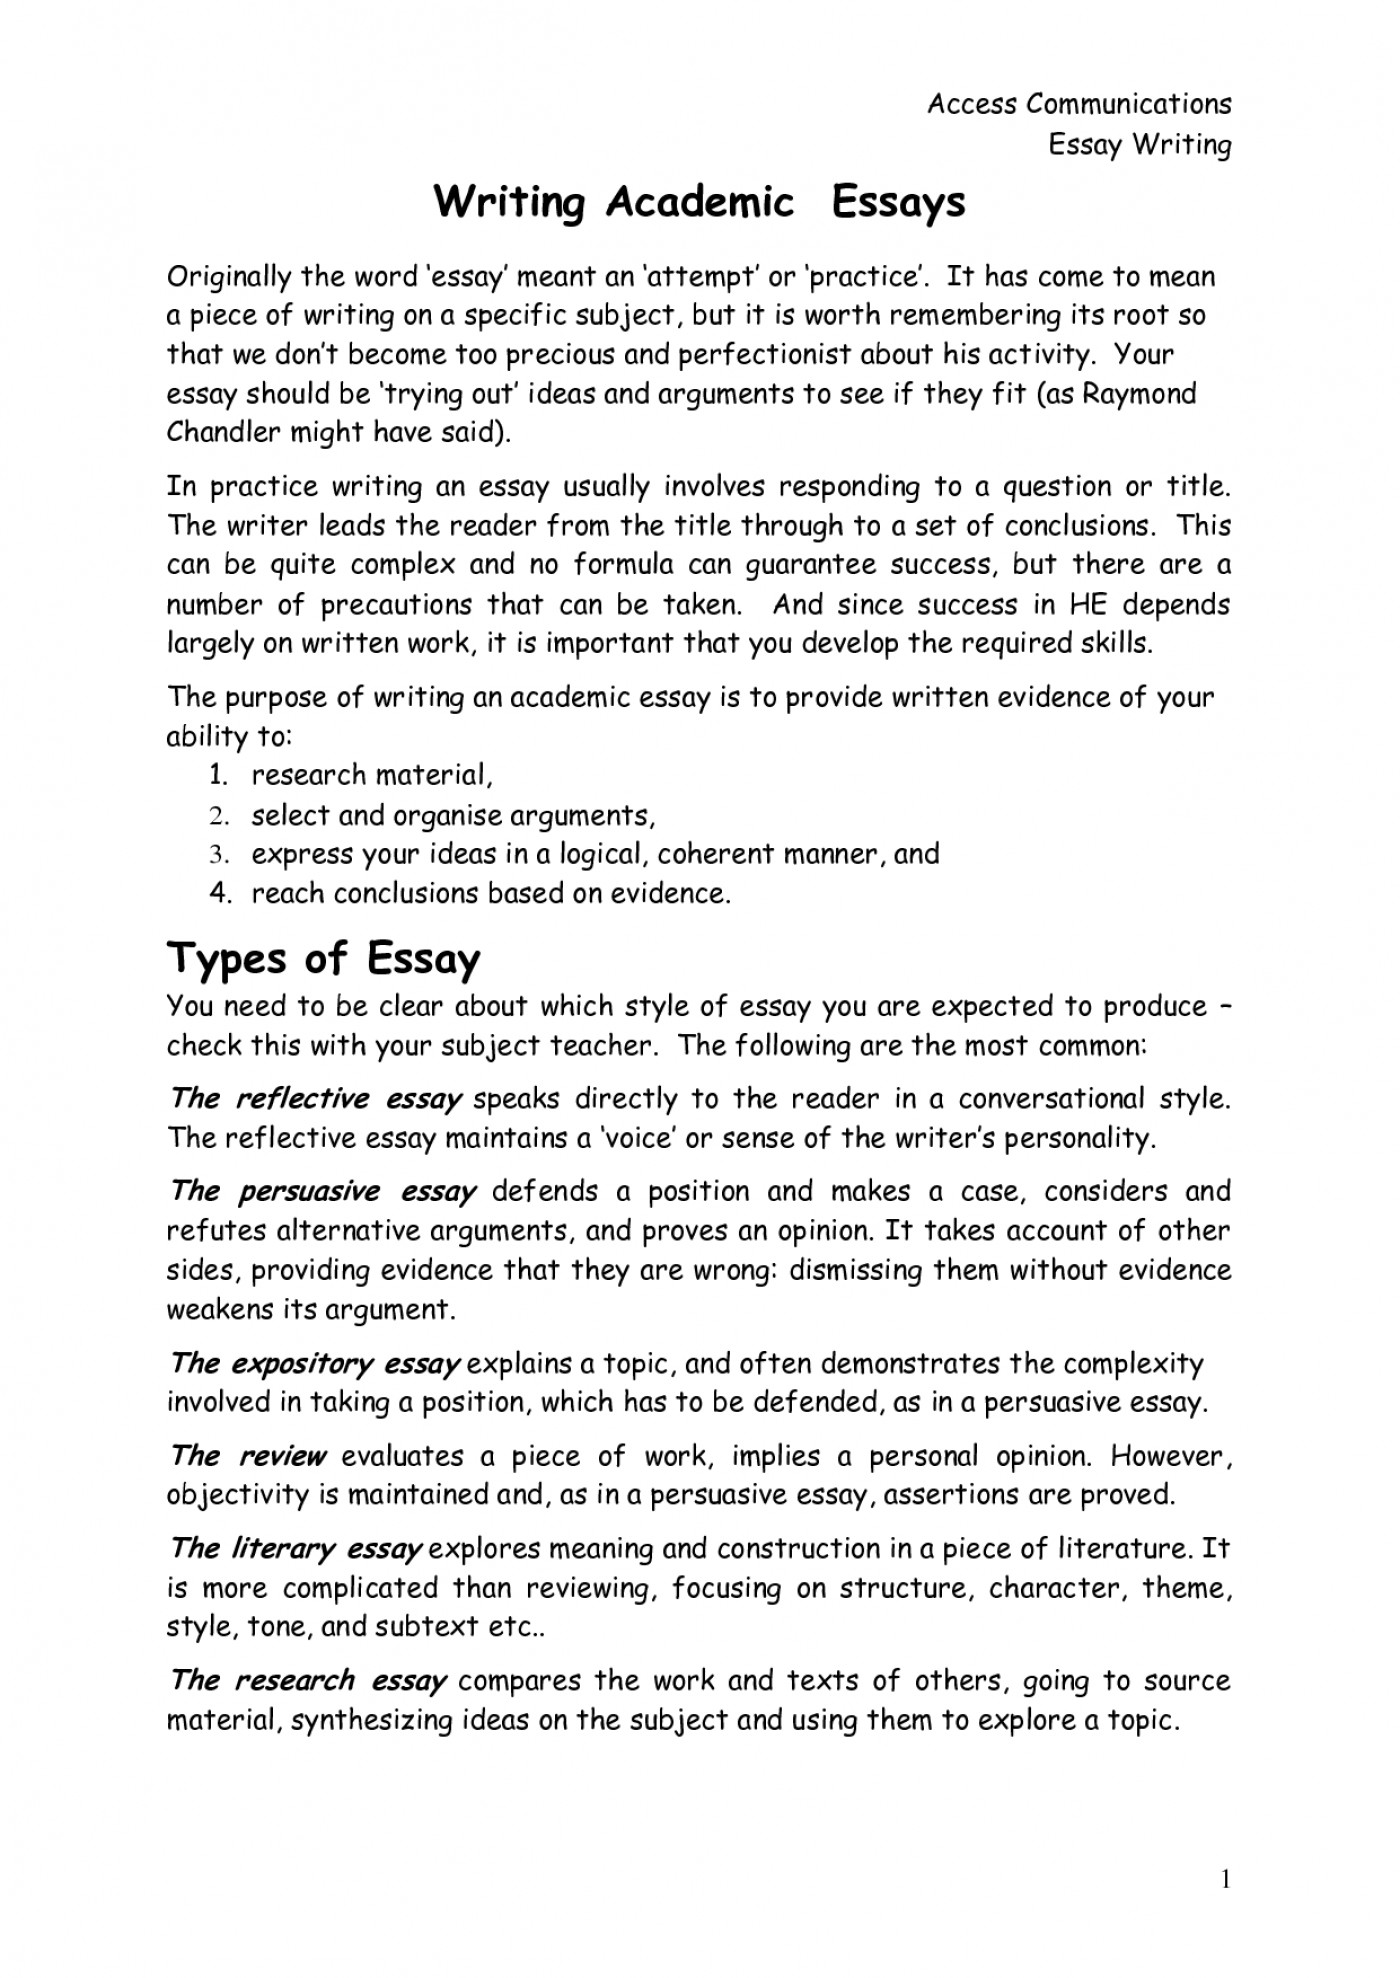 In narrative essay